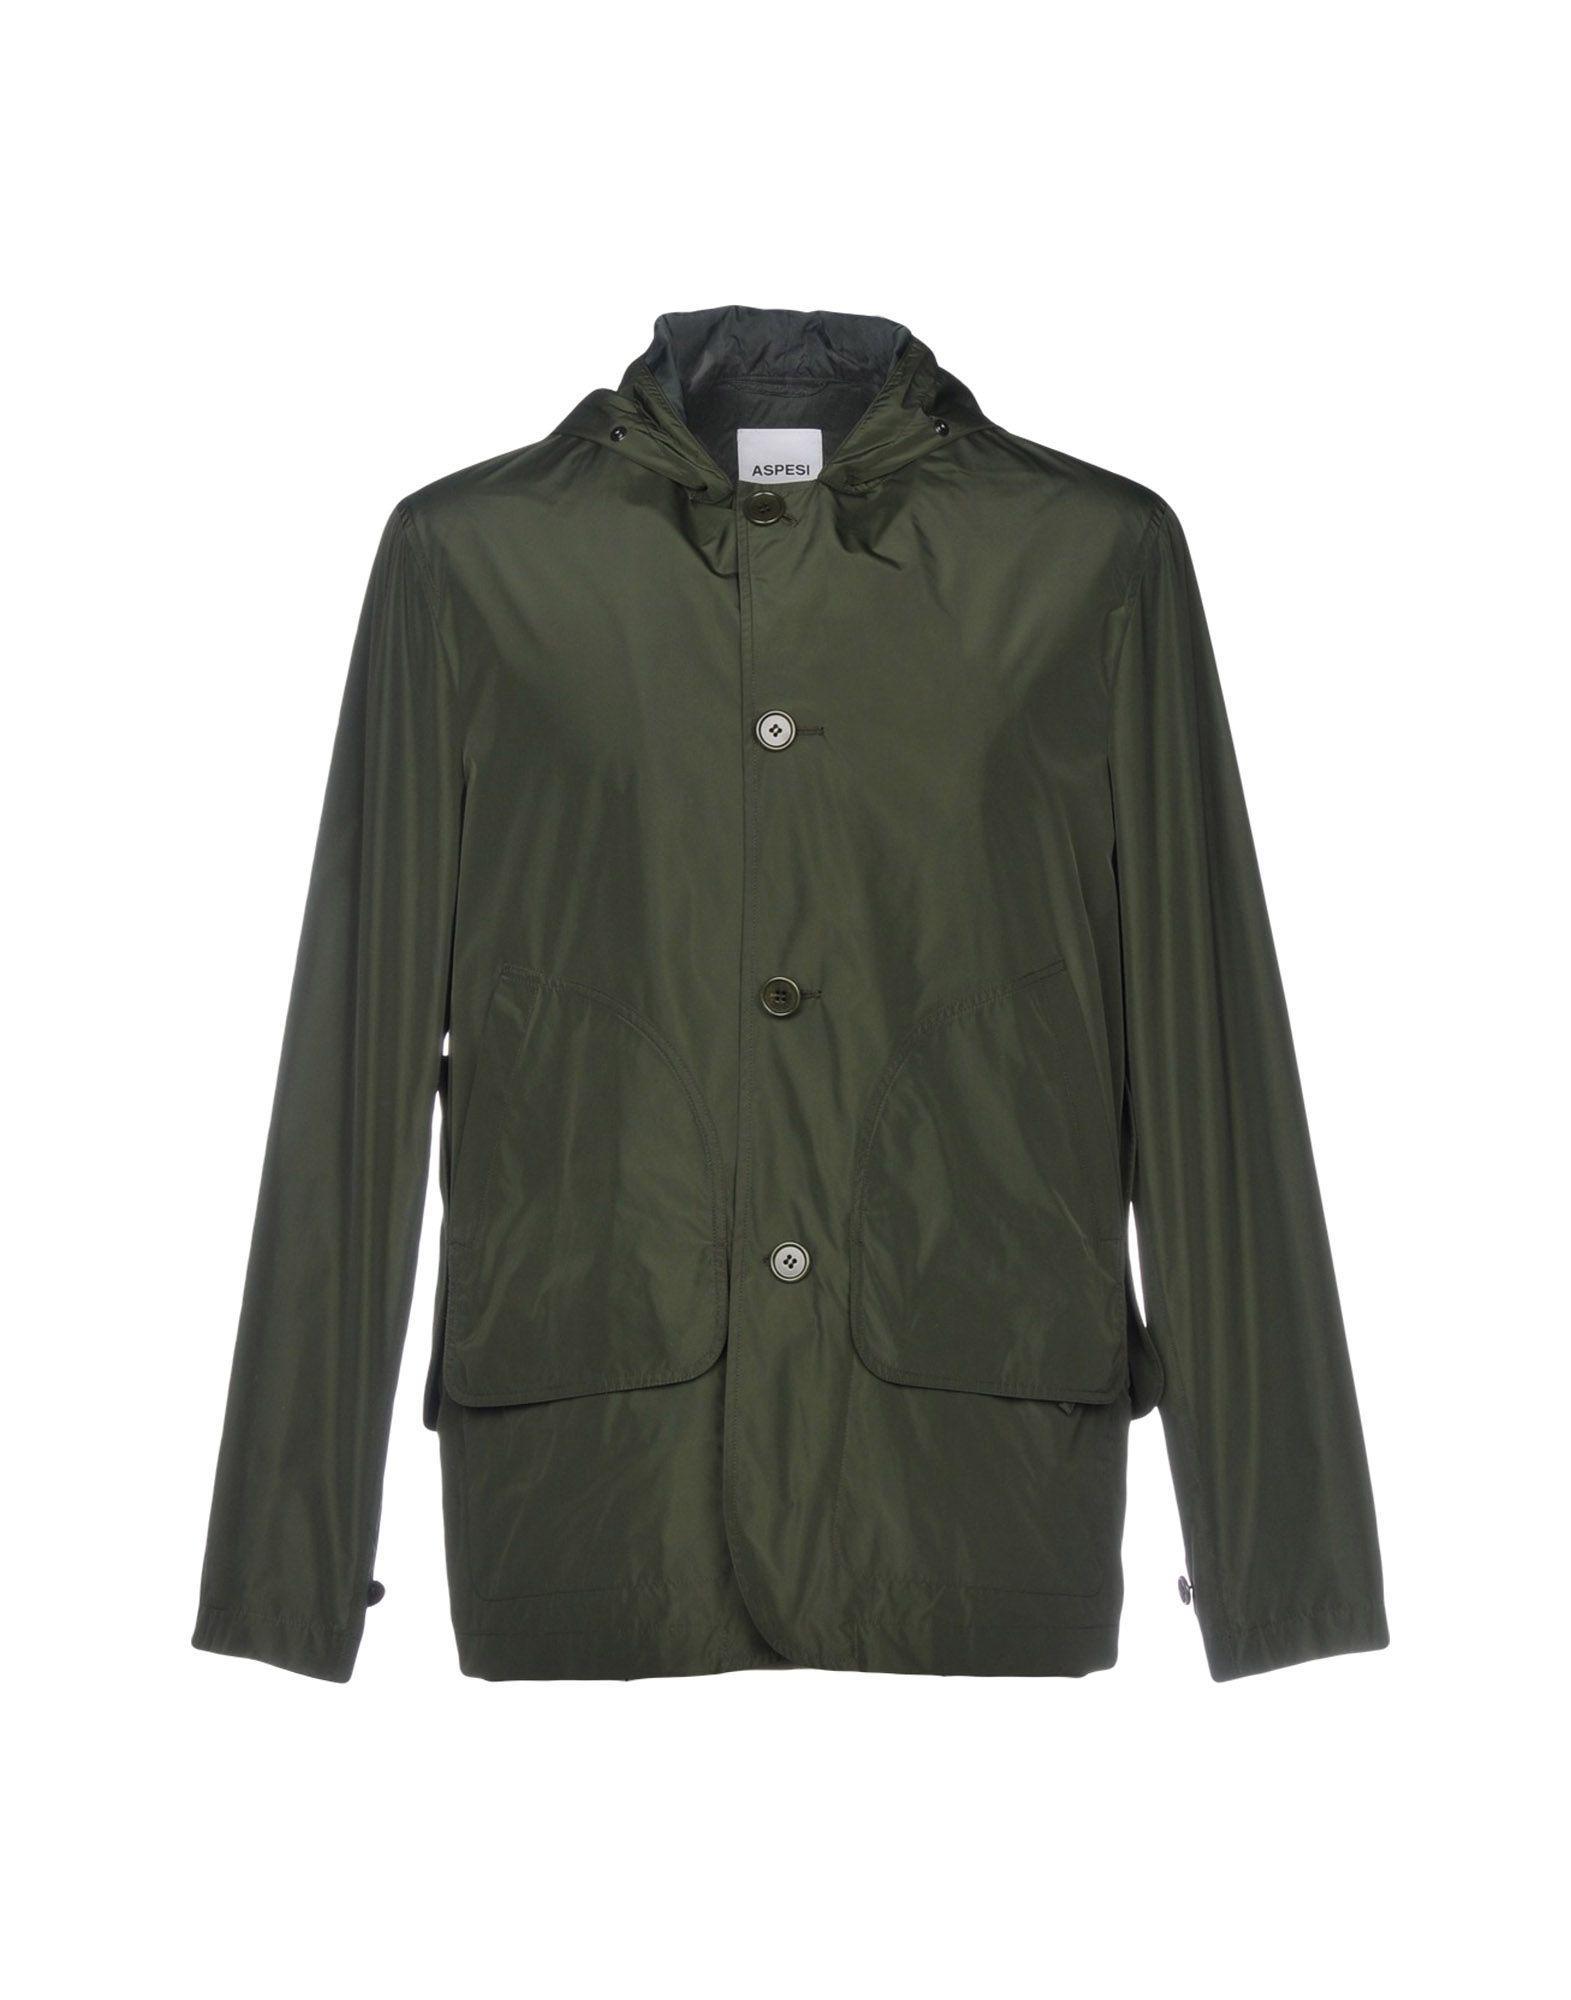 Aspesi Jackets In Dark Green